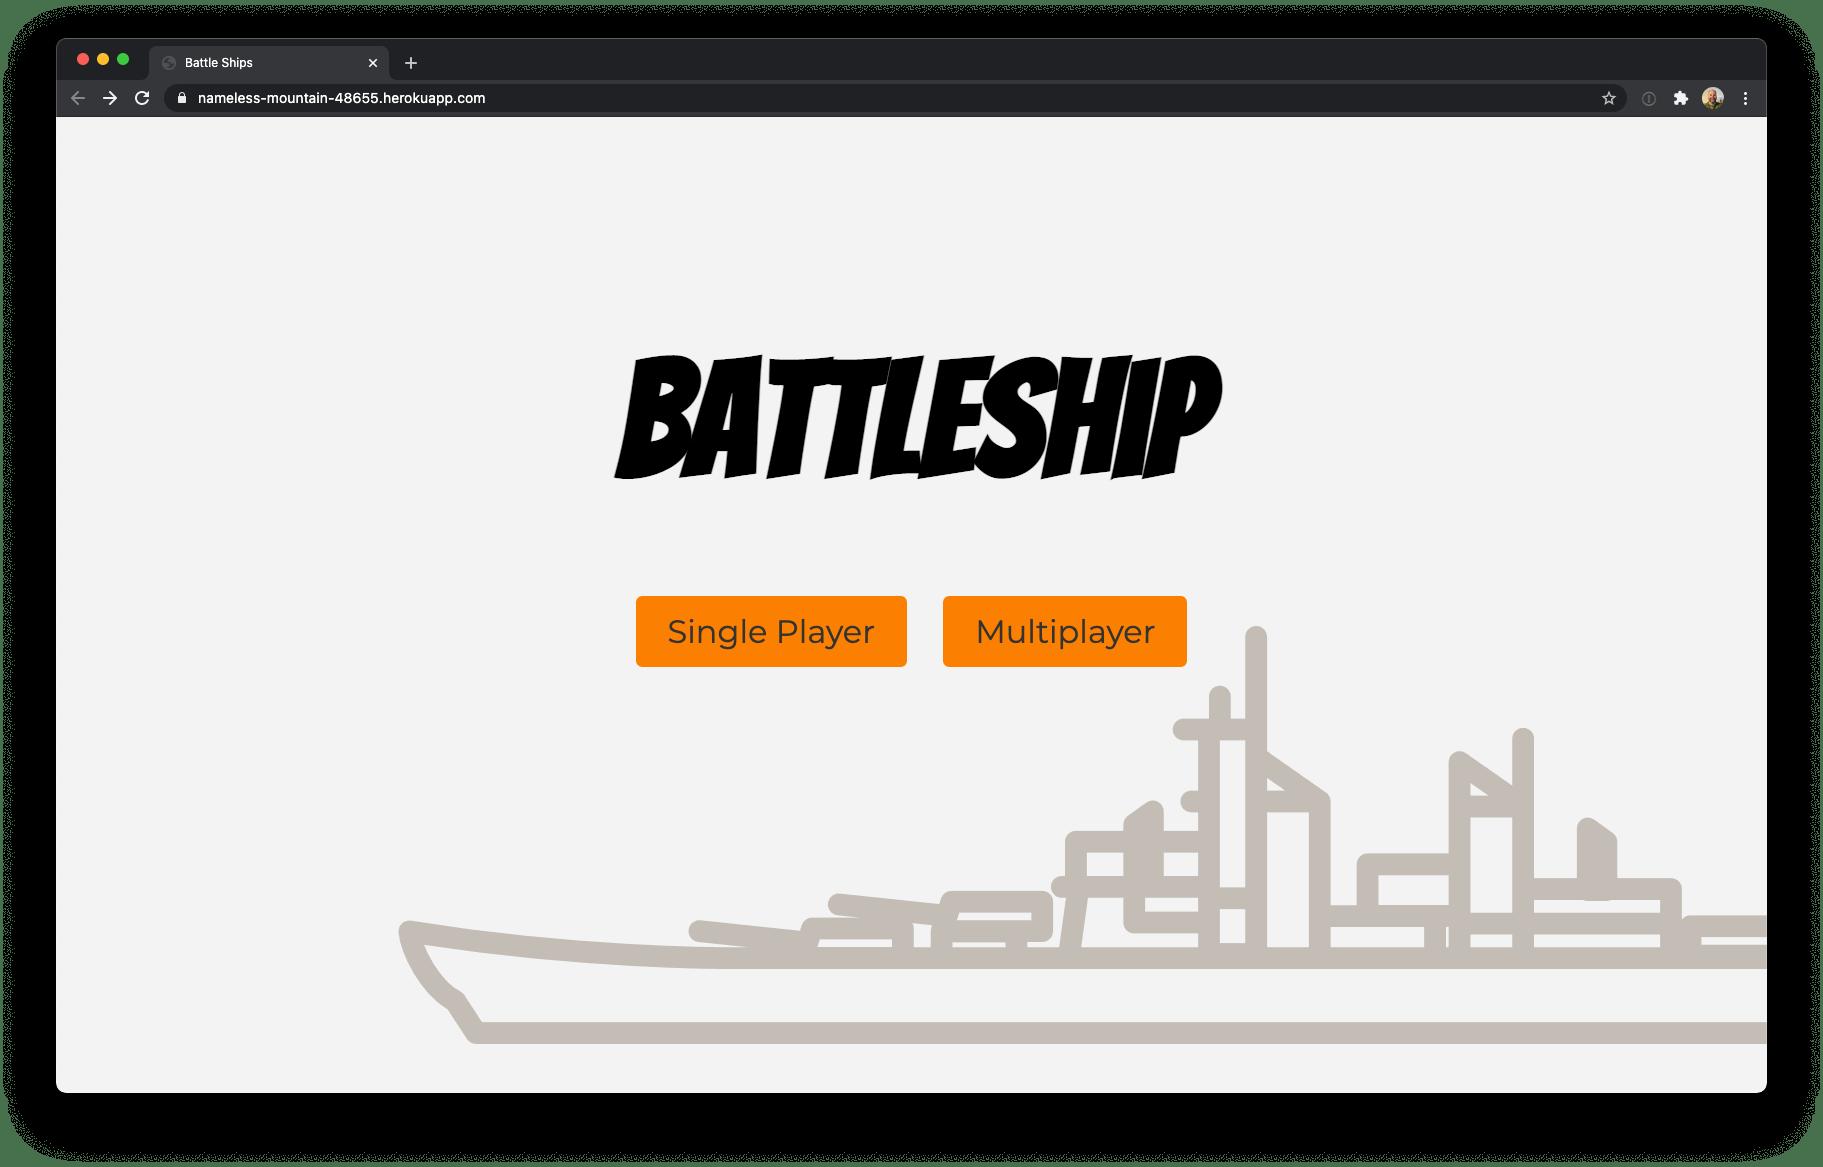 Battleship web app deployed with Heroku